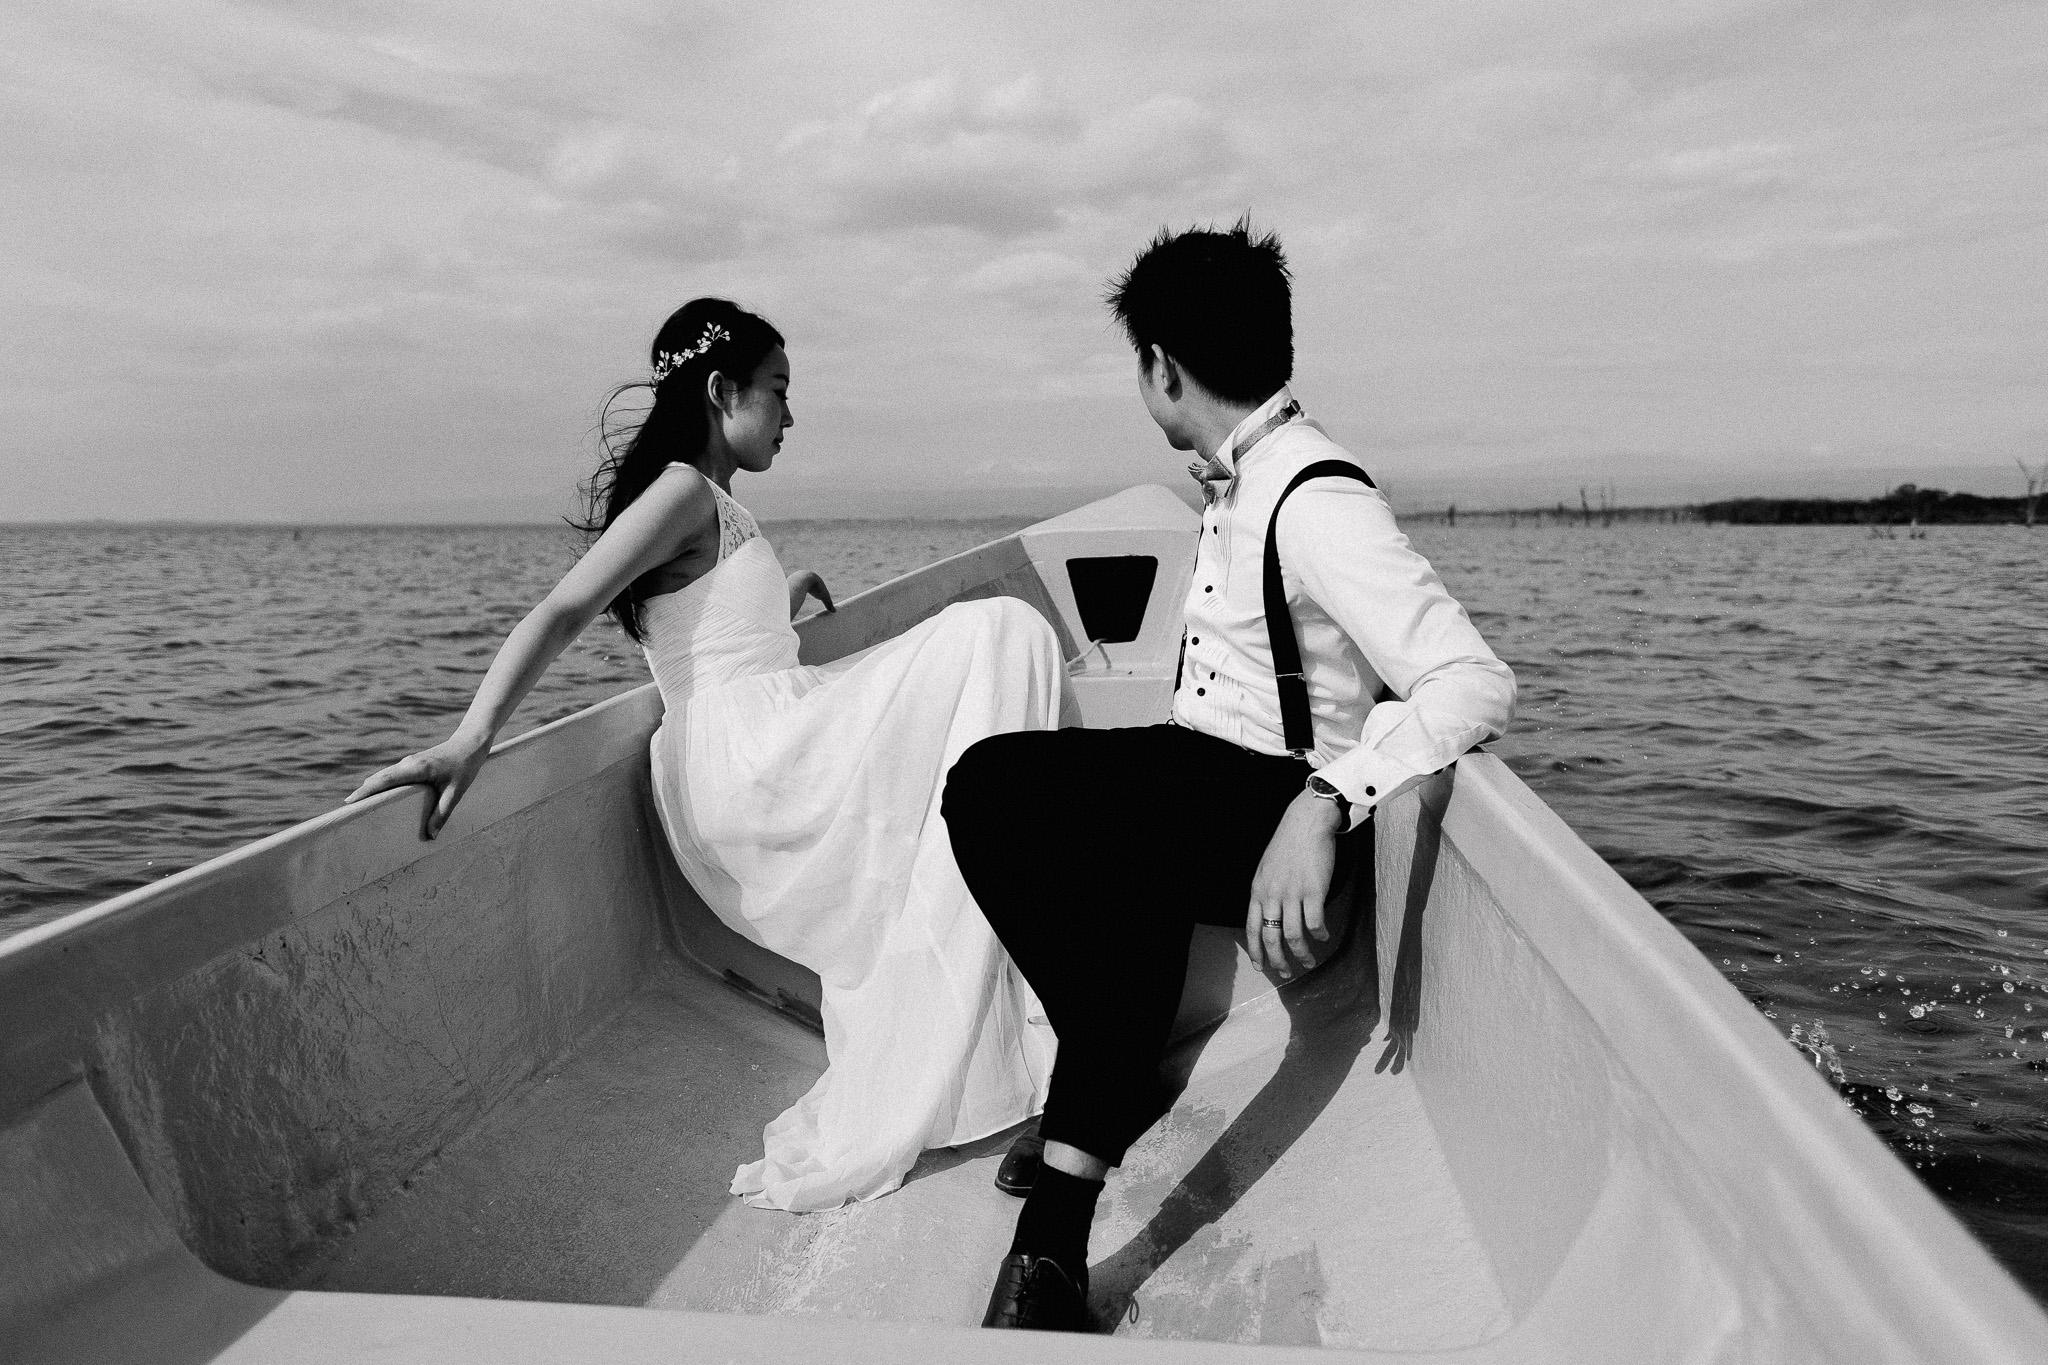 Anna-Hari-Photography-Safari-Elopement-Kenya-Wedding-Photographer-Kenya-5.jpg